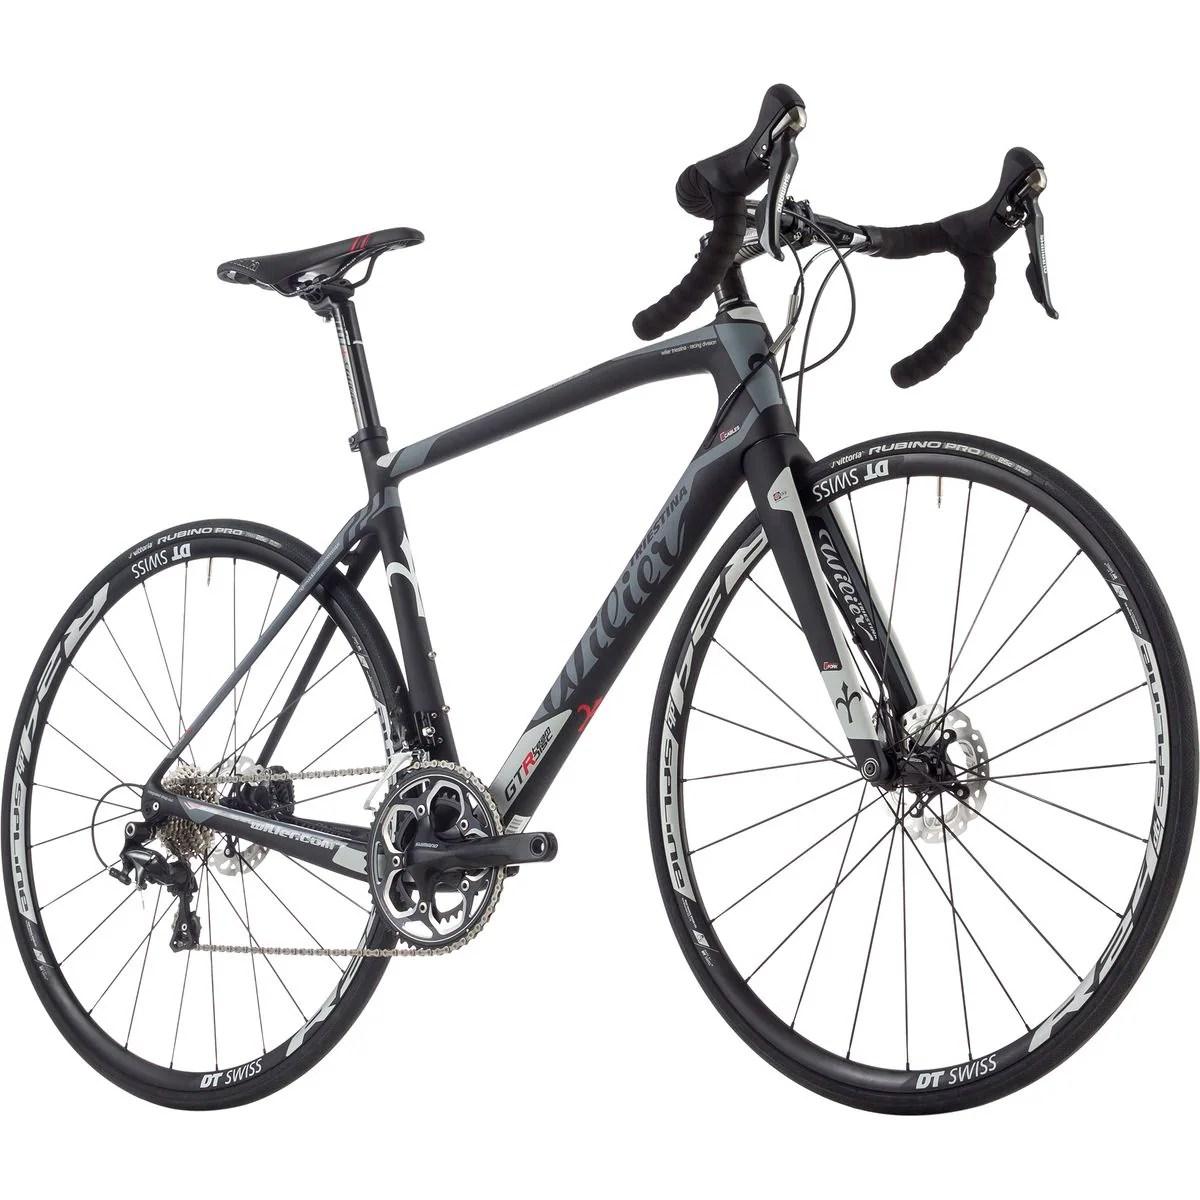 Wilier Gtr Team Disc Ultegra Complete Road Bike